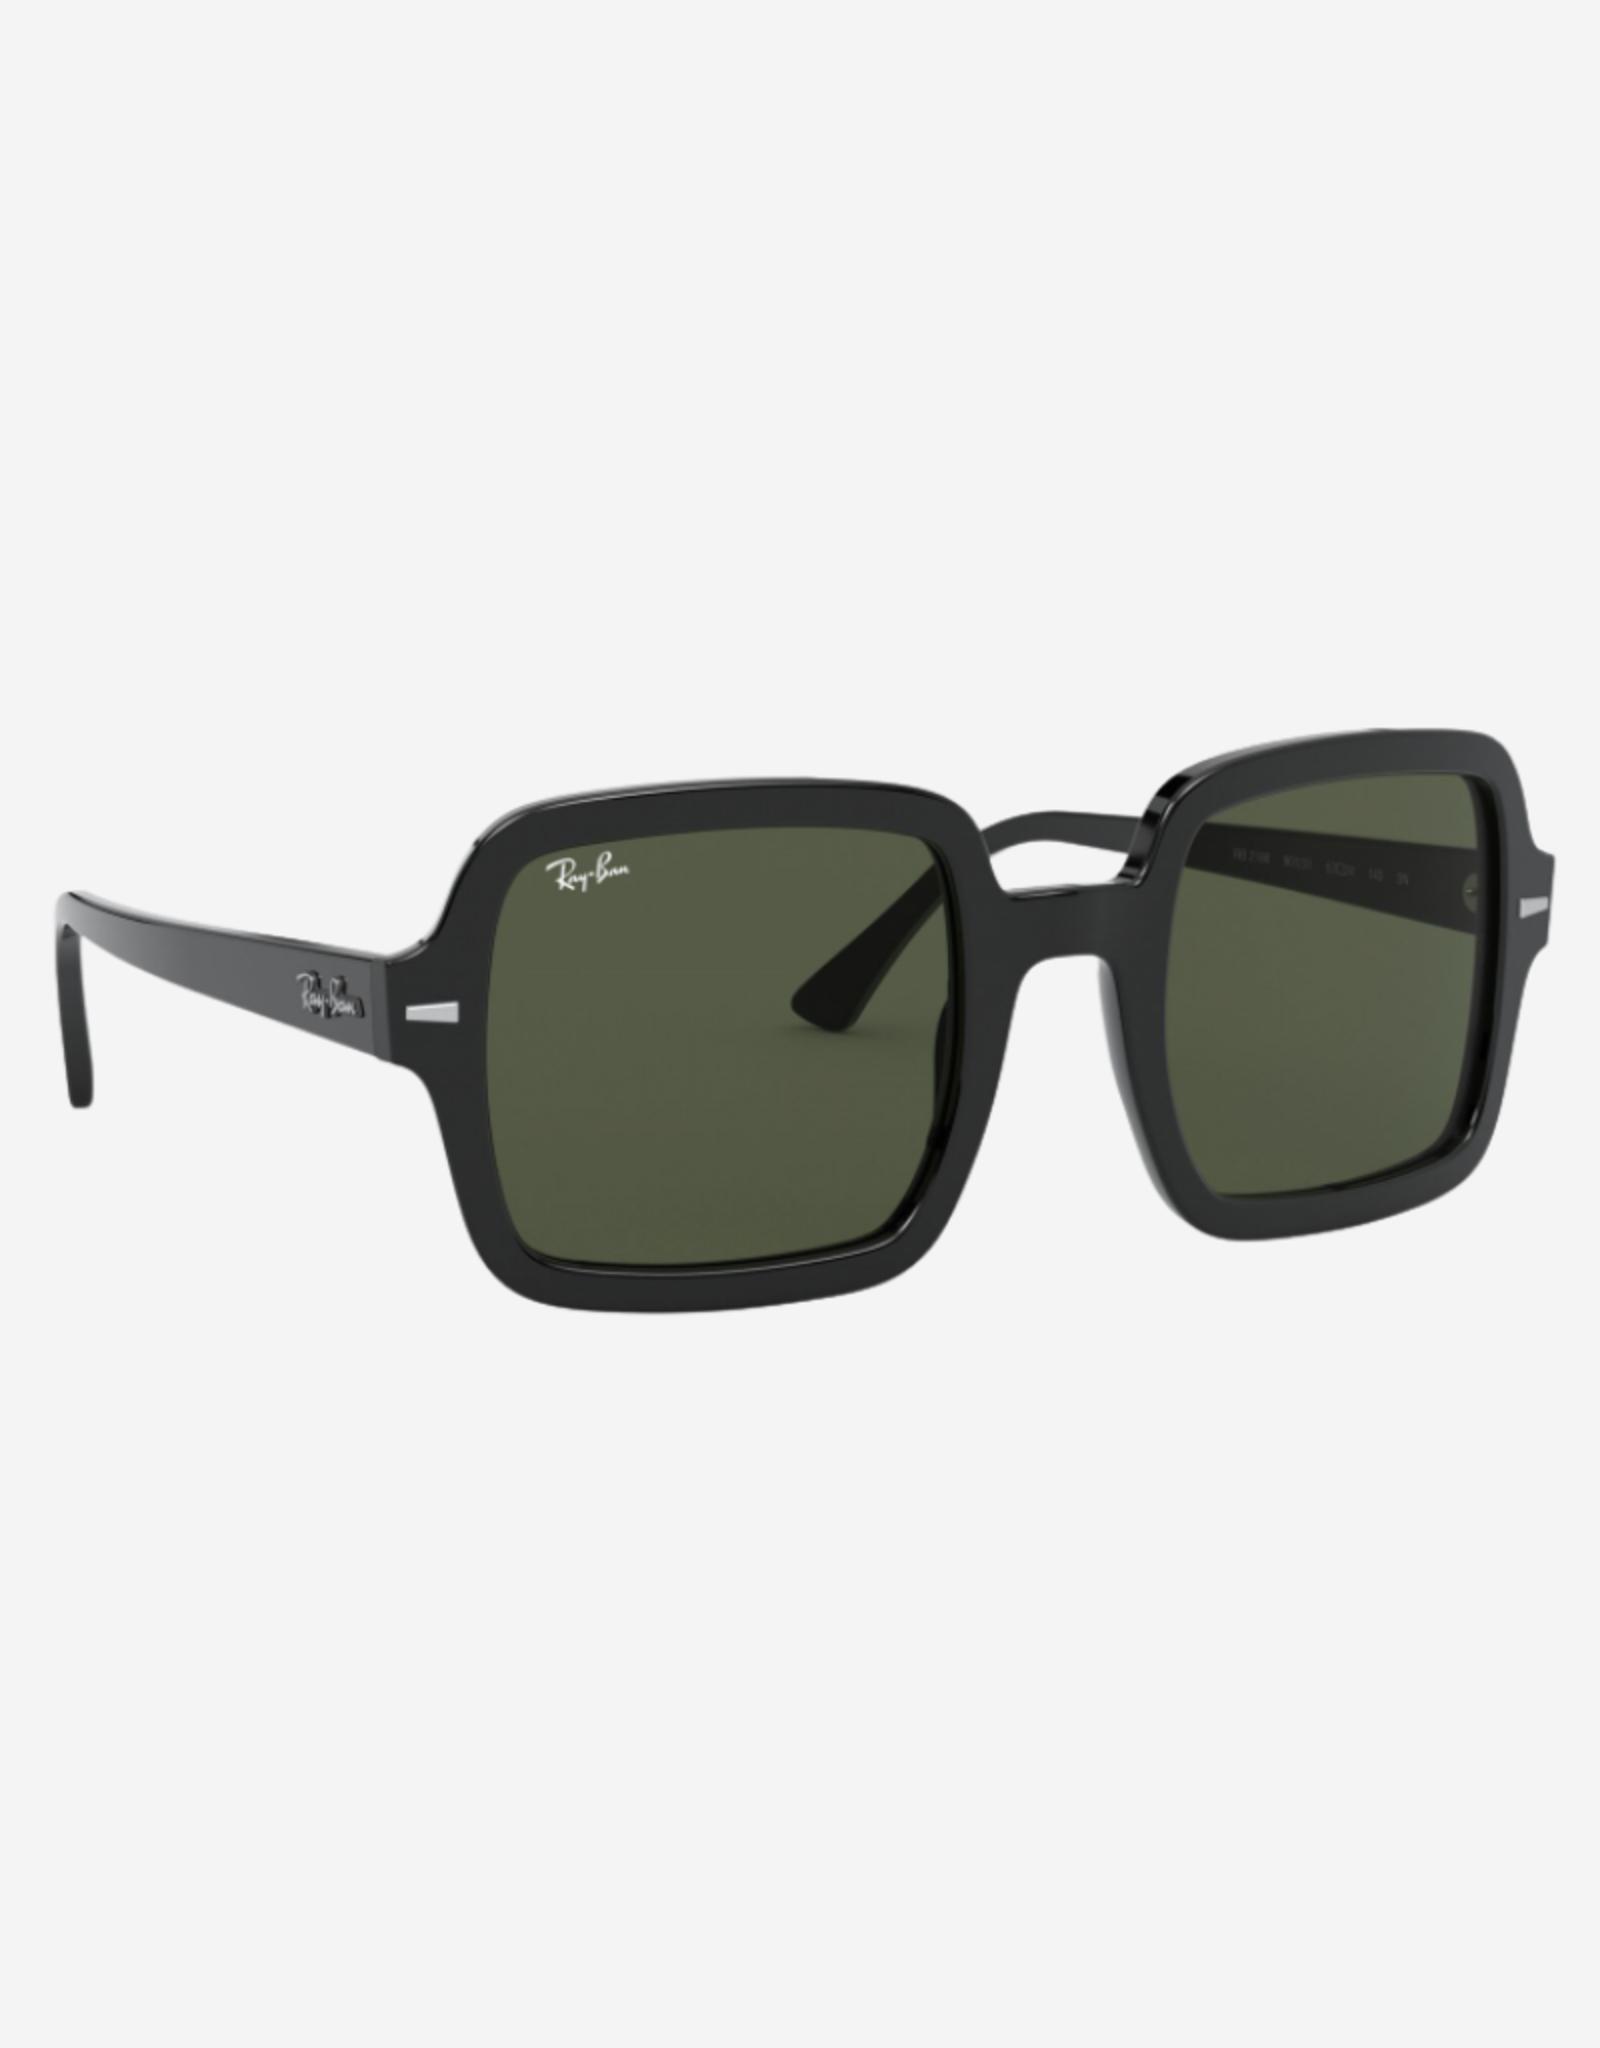 RAY BAN RAY BAN BLACK W/G-15 ORB2188-901/3153